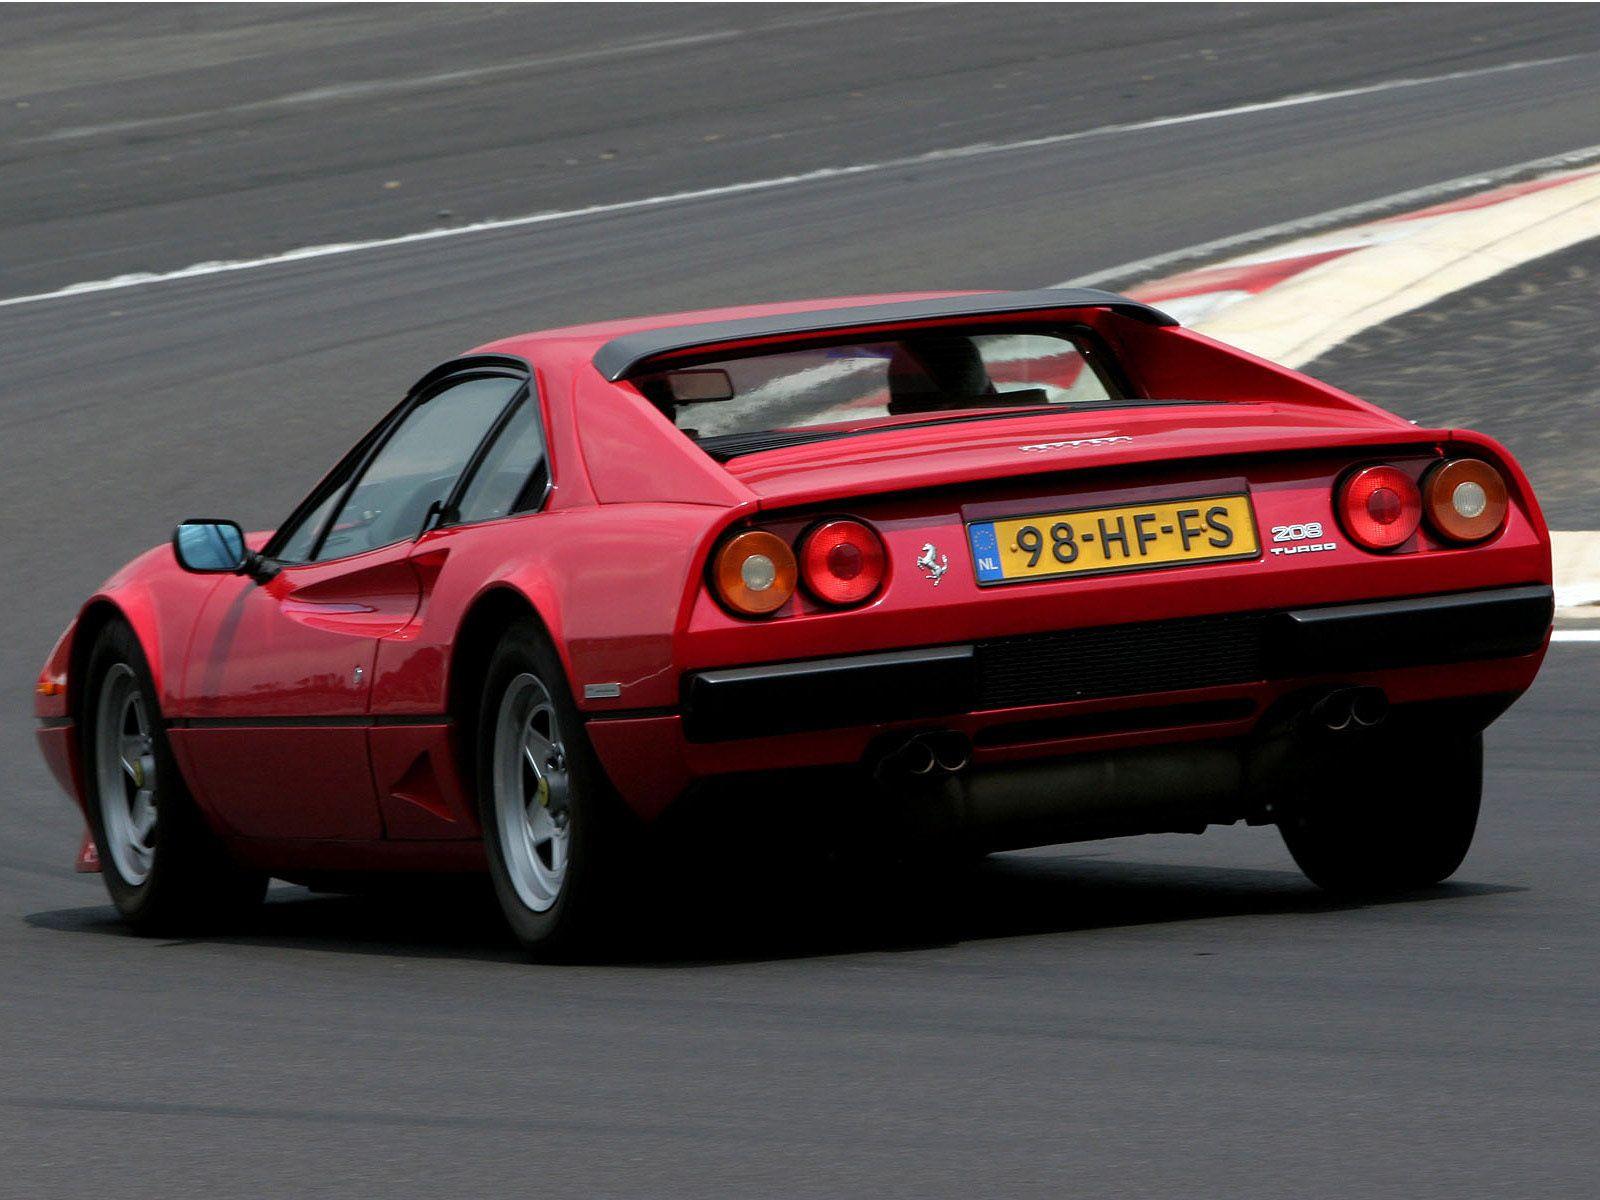 Ferrari 208 Gtb Turbo 1982 Ferrari Turbo Turbo S